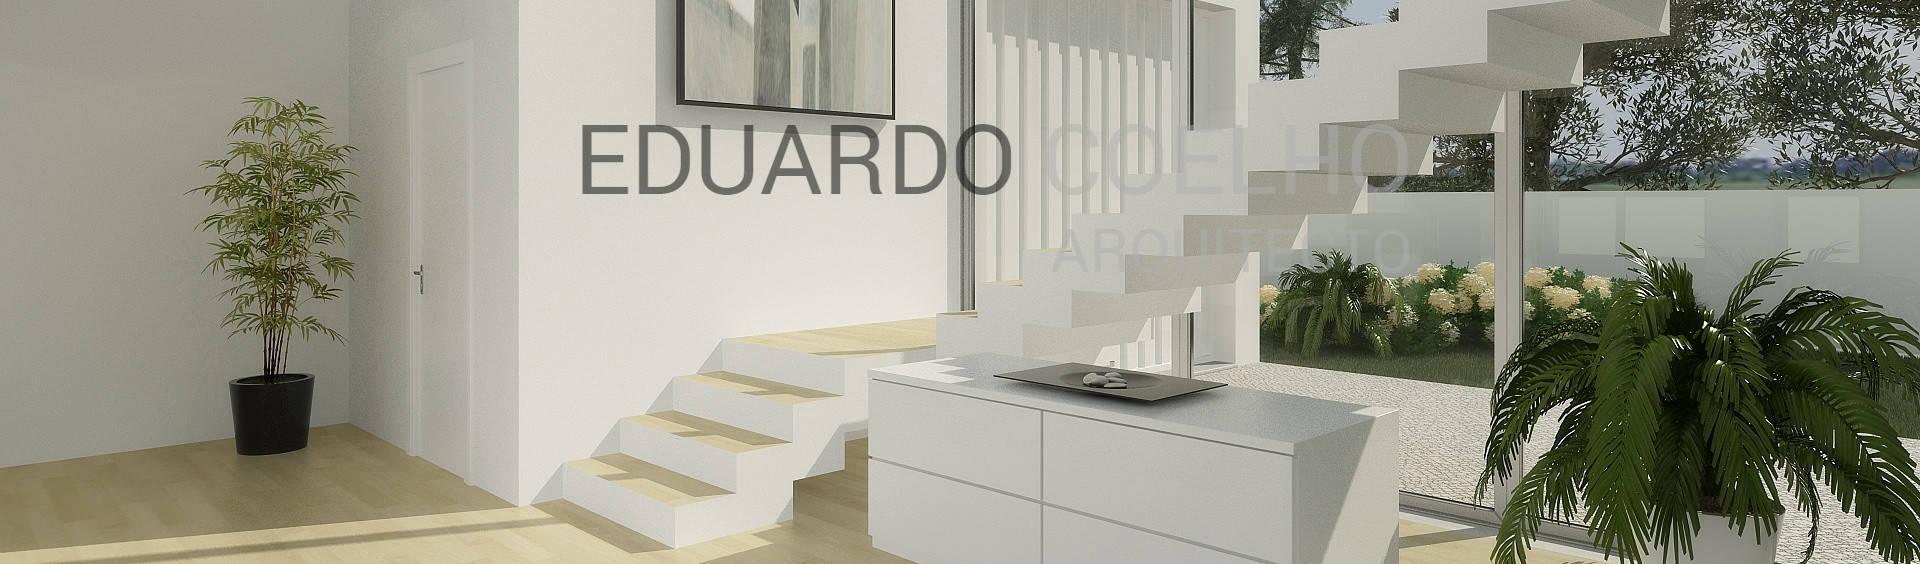 Eduardo Coelho | Arquitecto